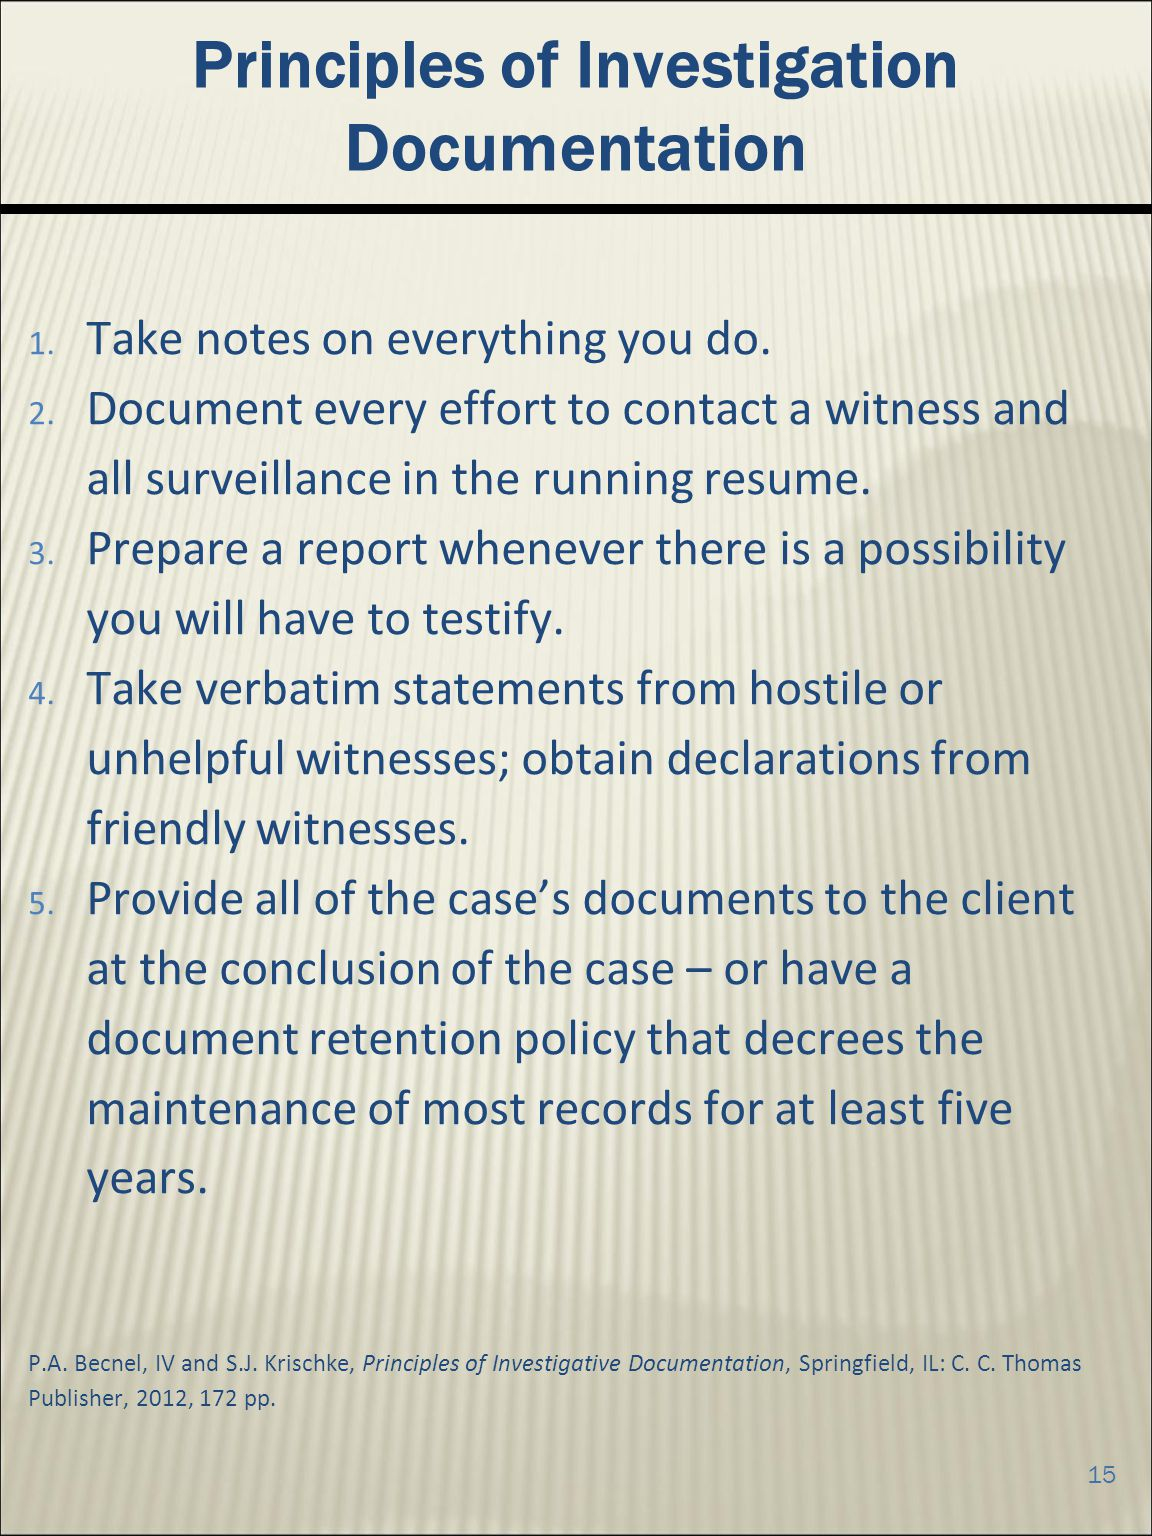 Principles of Investigation Documentation